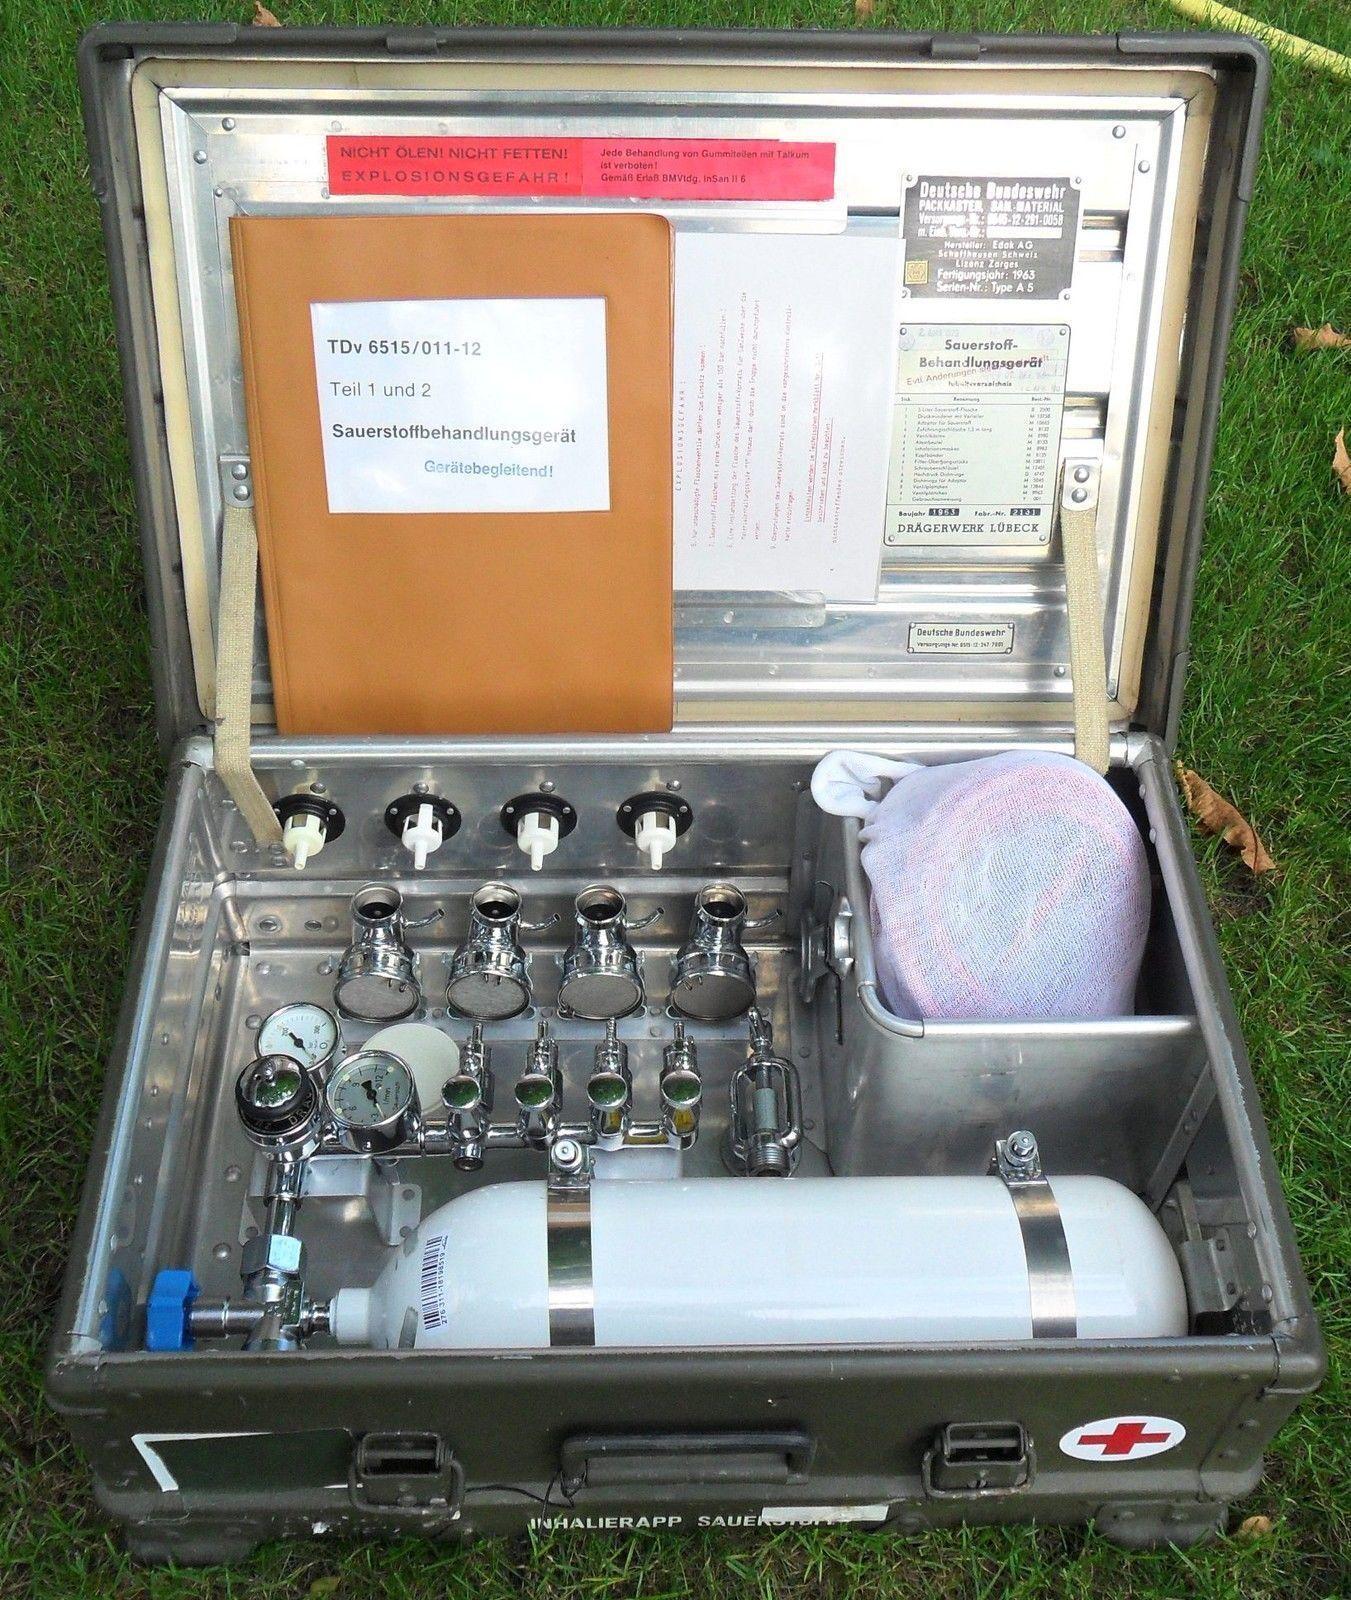 Zarges Kiste A5 NEUE BAUART Sauerstoff Inhaliergerät Dräger TÜV bis max 2027